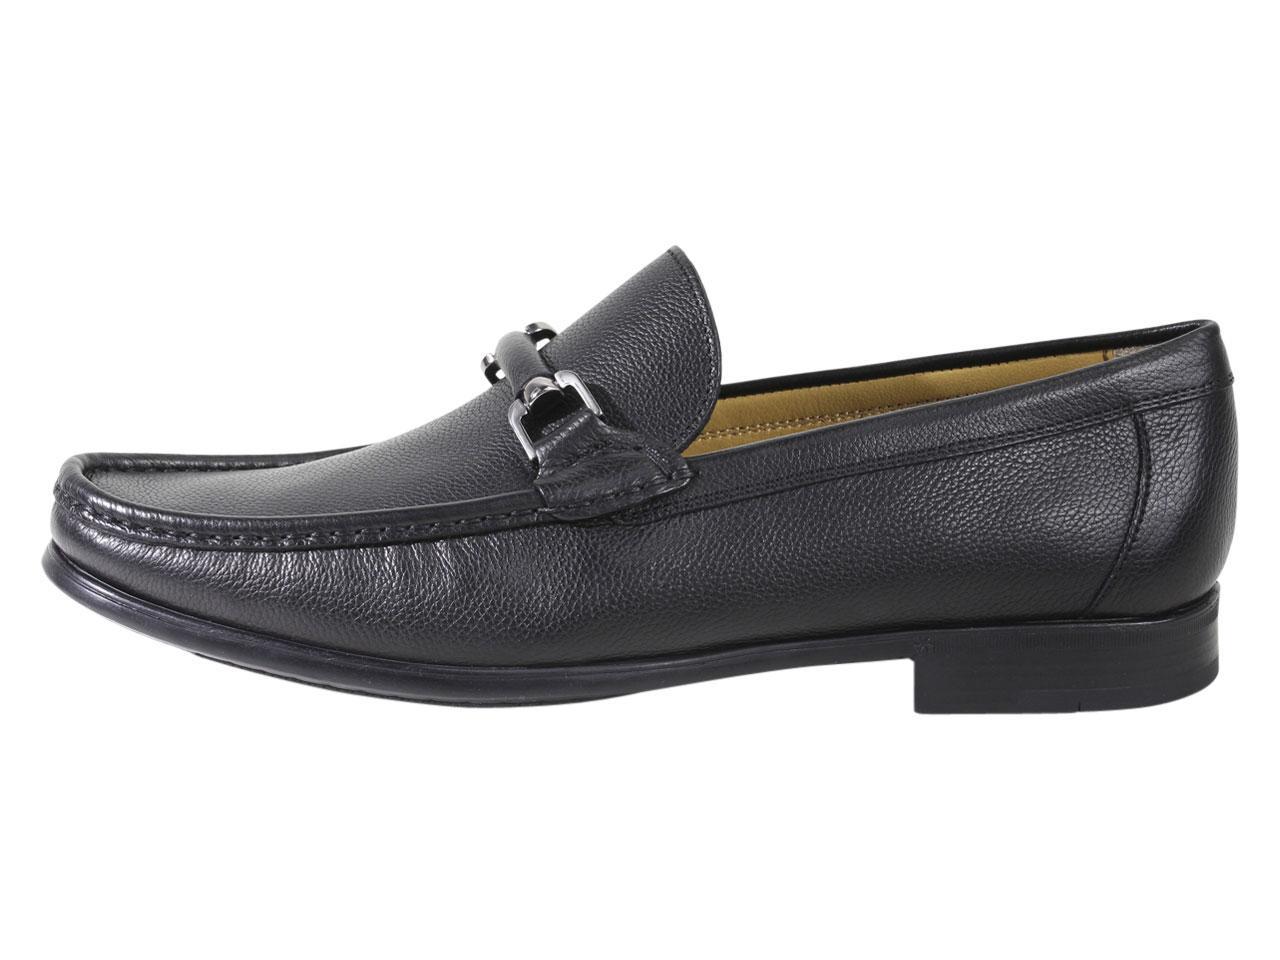 031dba98c46 Bruno Magli Men s Salento Bit Loafers Shoes